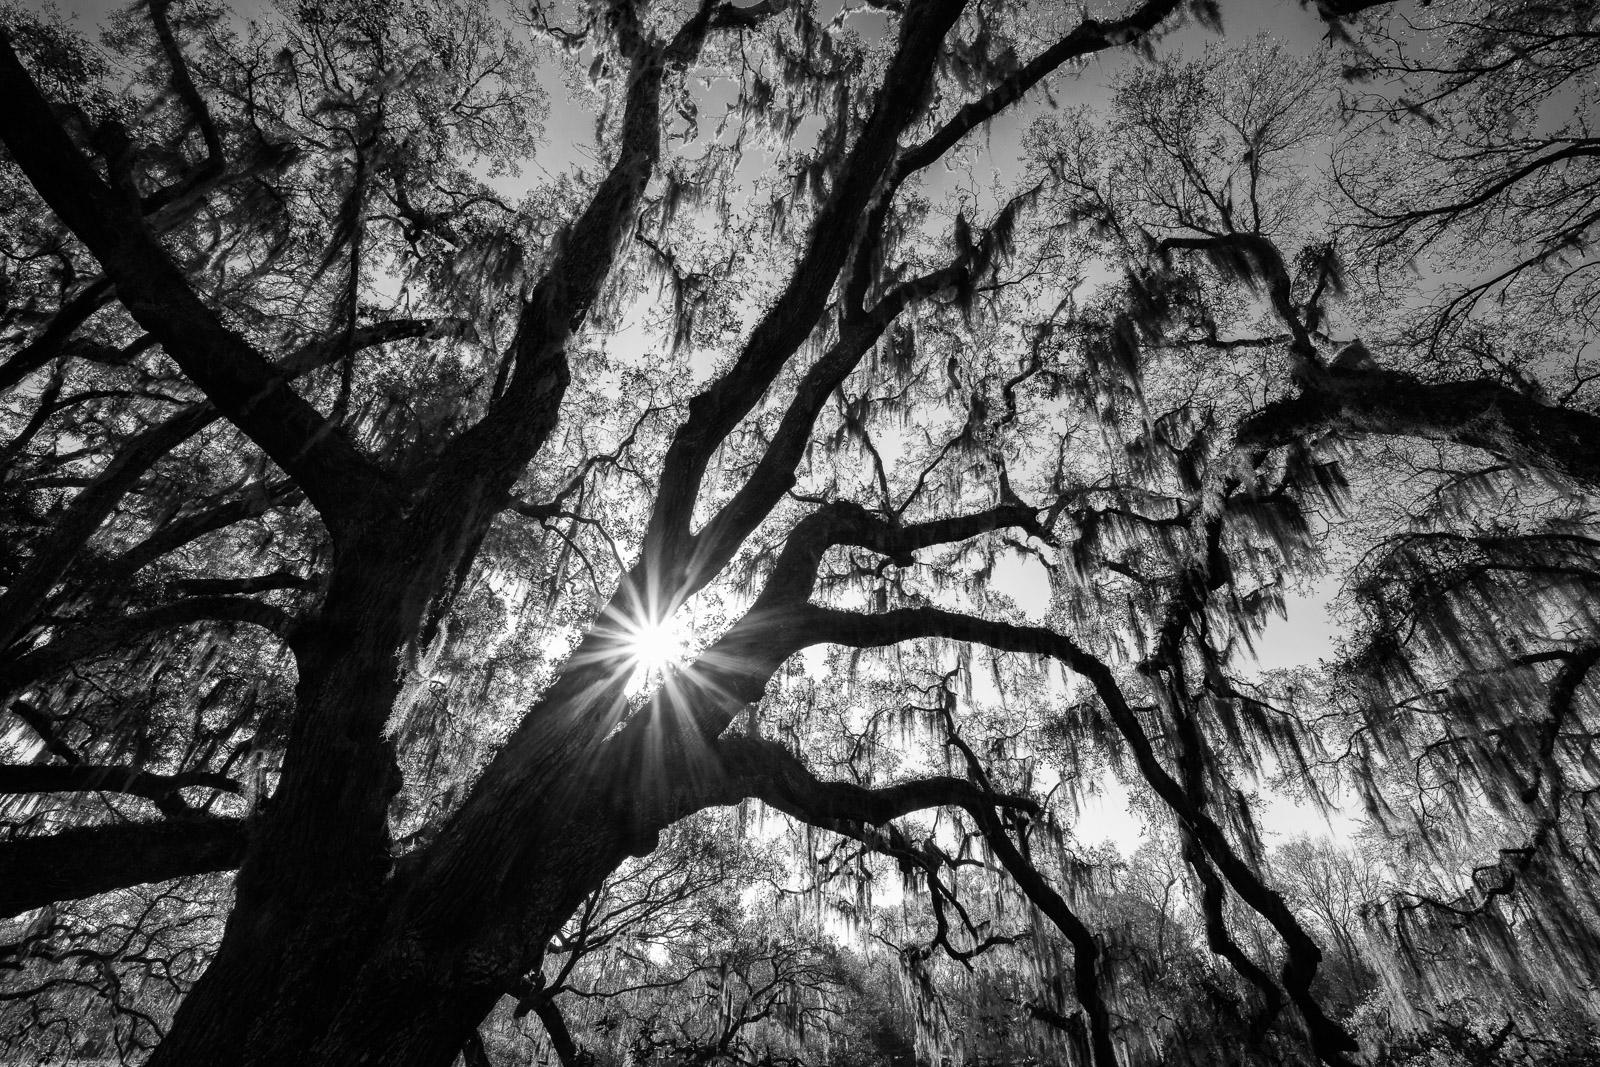 Live Oak in Magnolia Plantation & Gardens outside of Charleston.